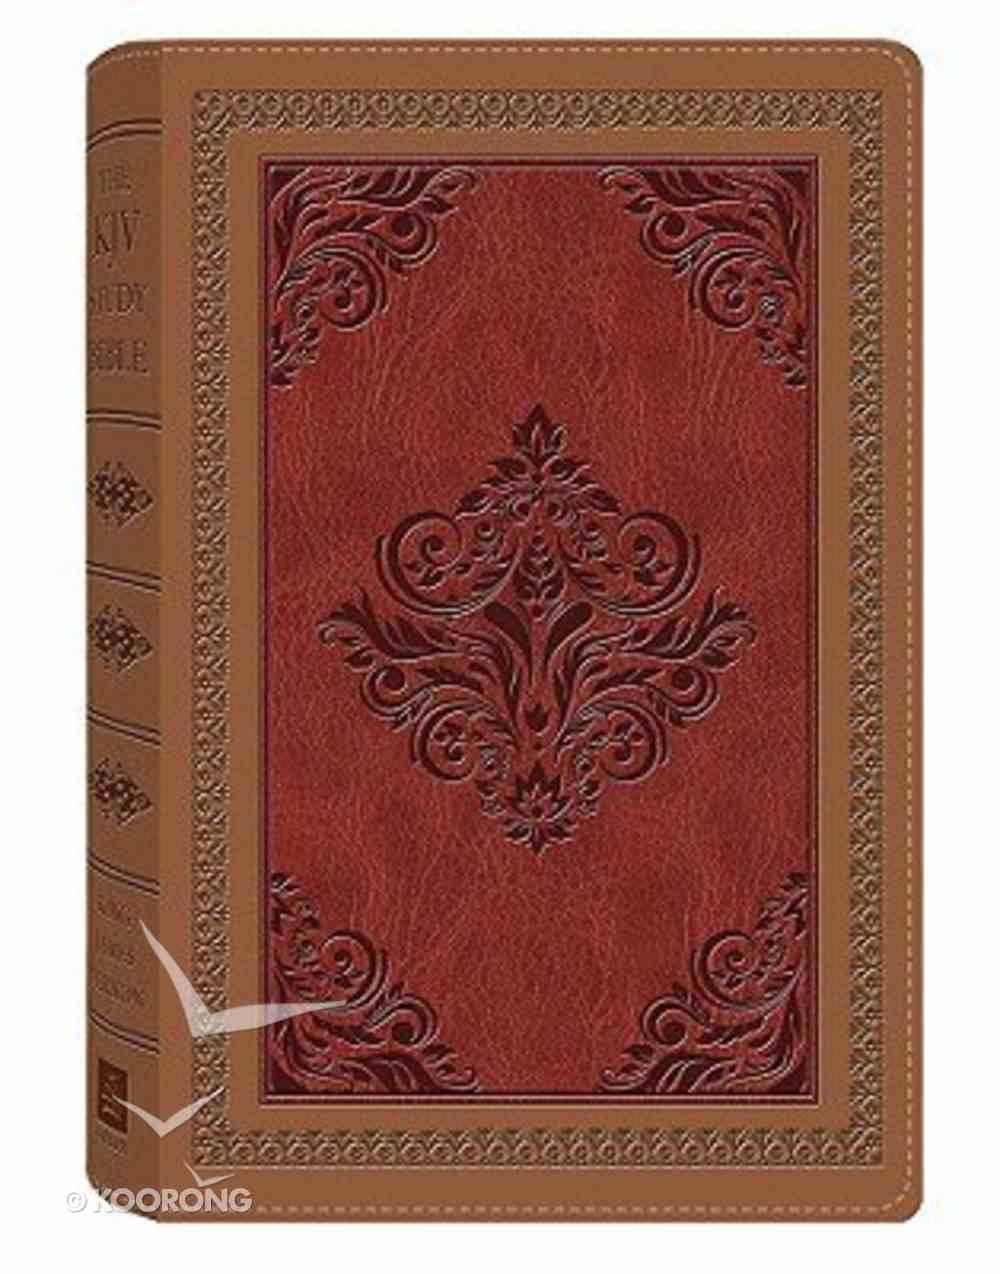 KJV Study Dicarta Antique Imitation Leather